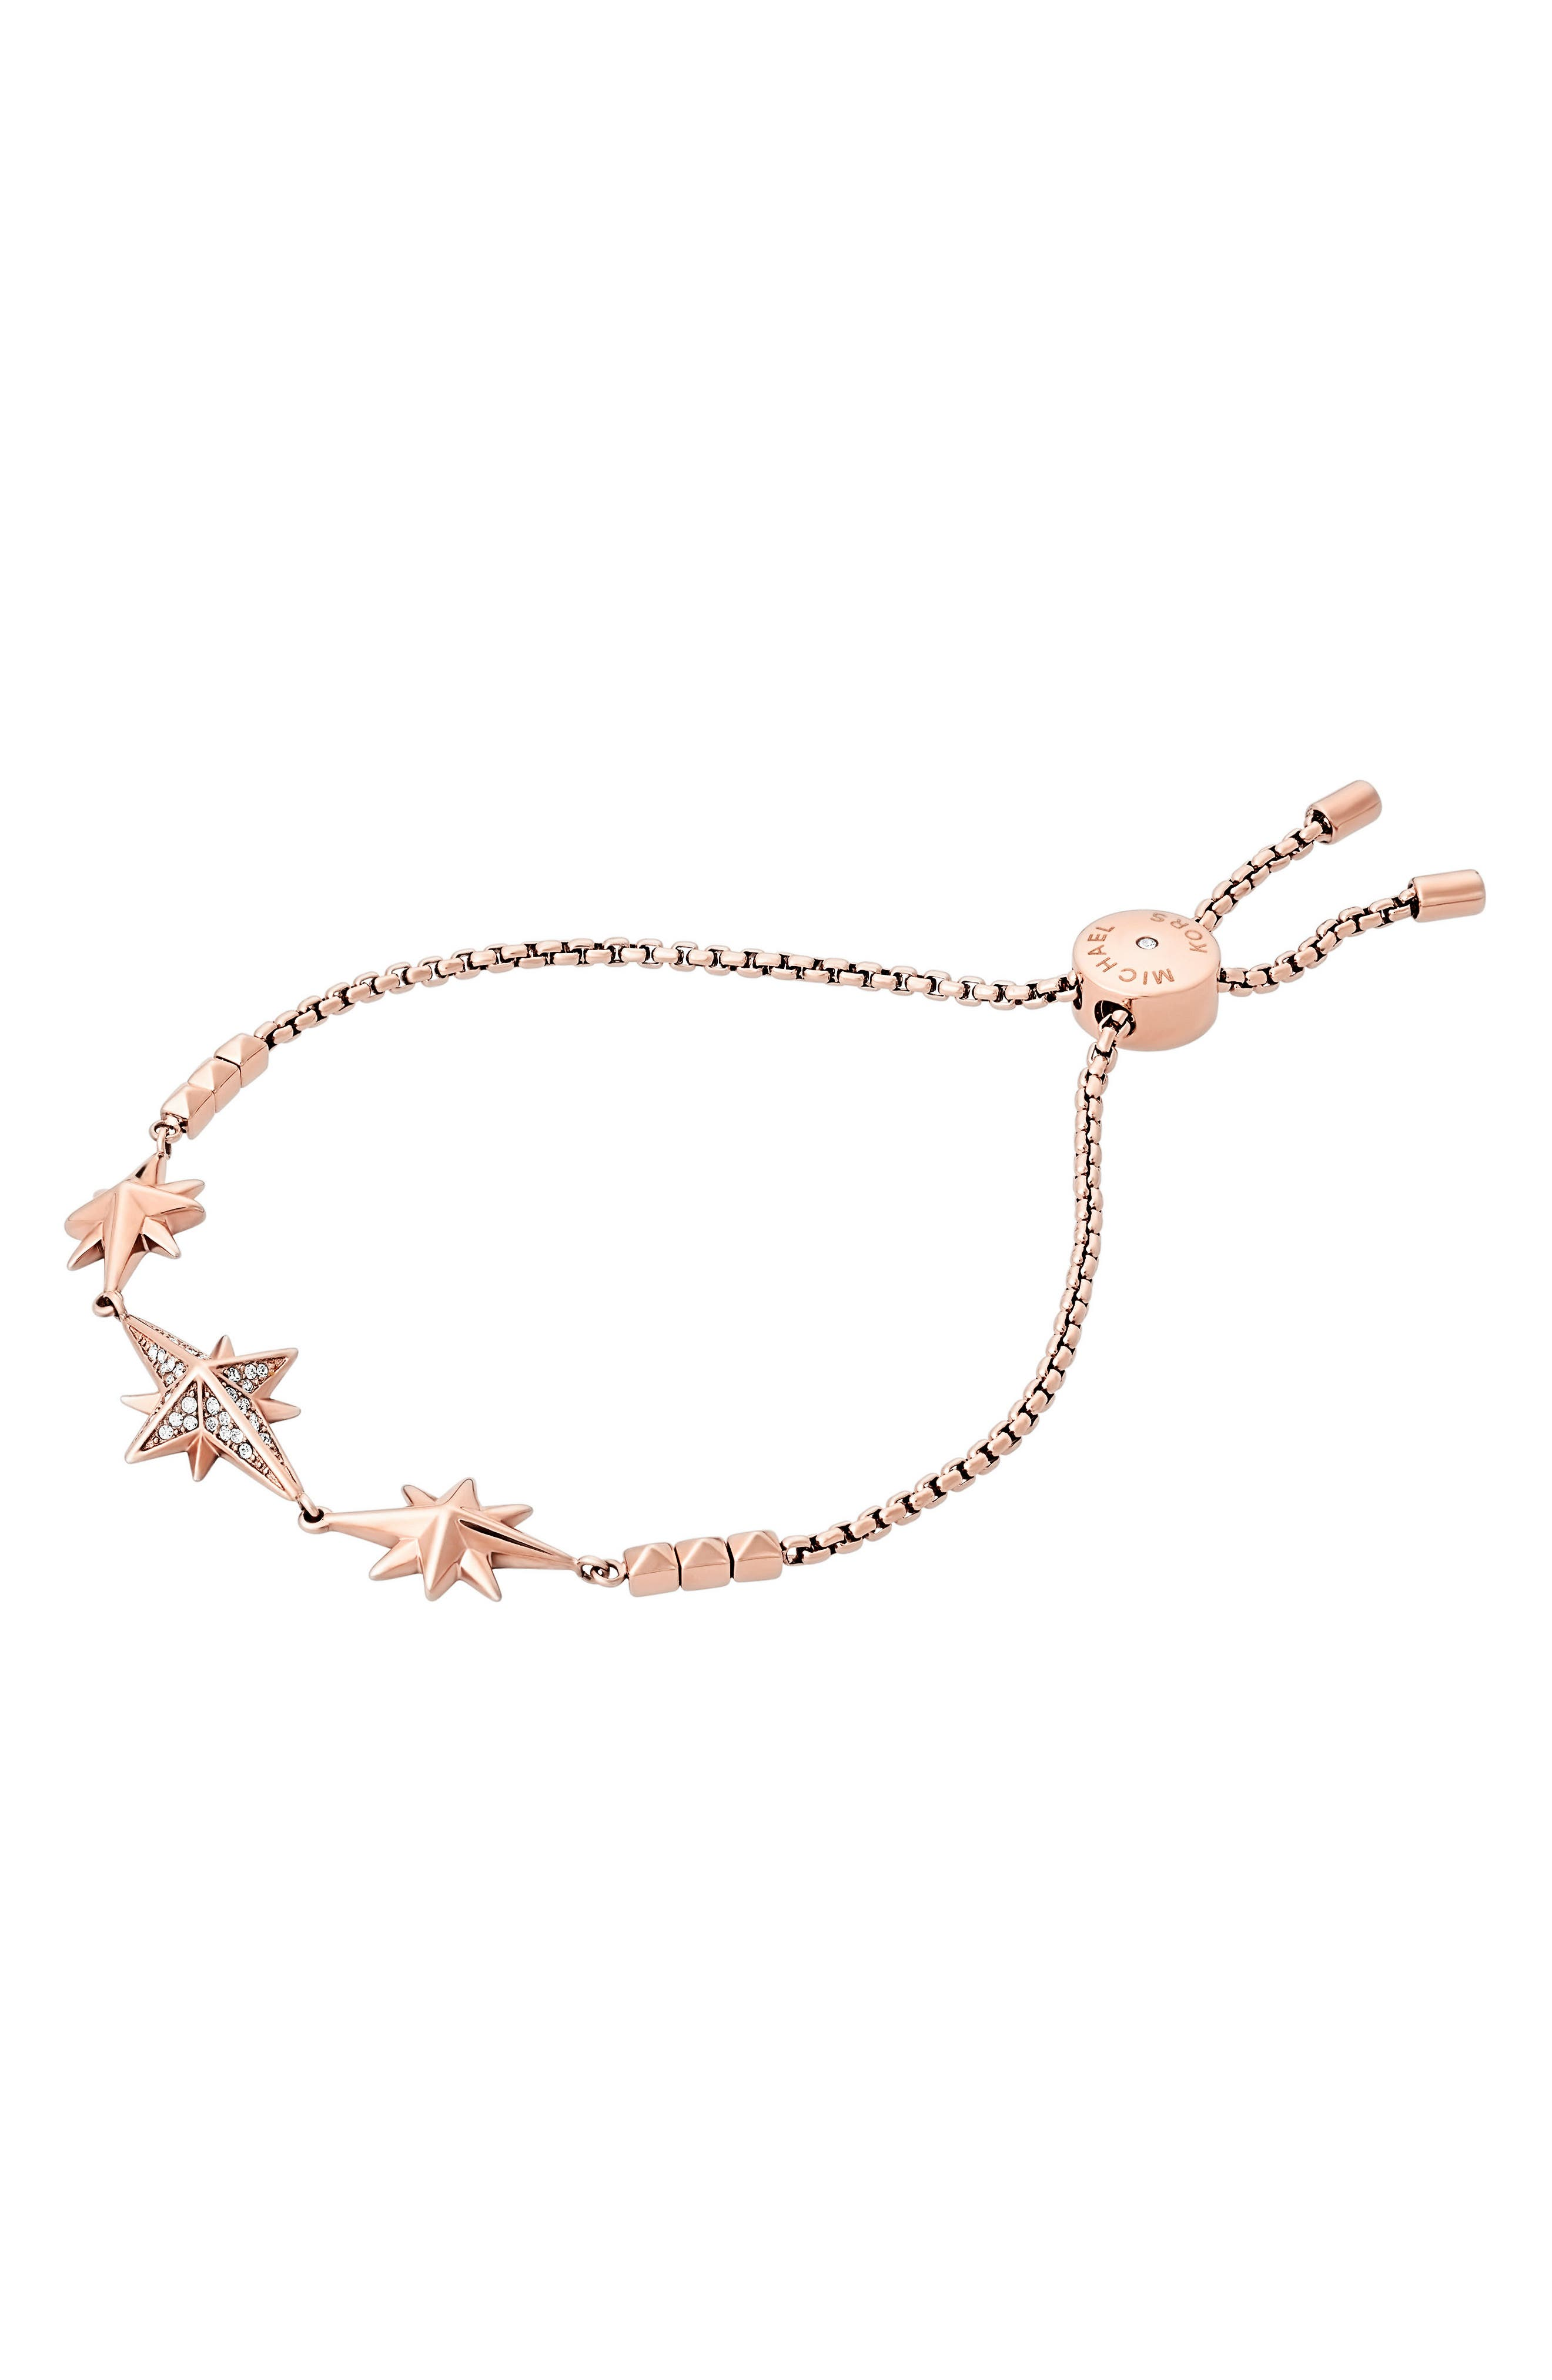 Michael Kors Adjustable Slide Charm Bracelet